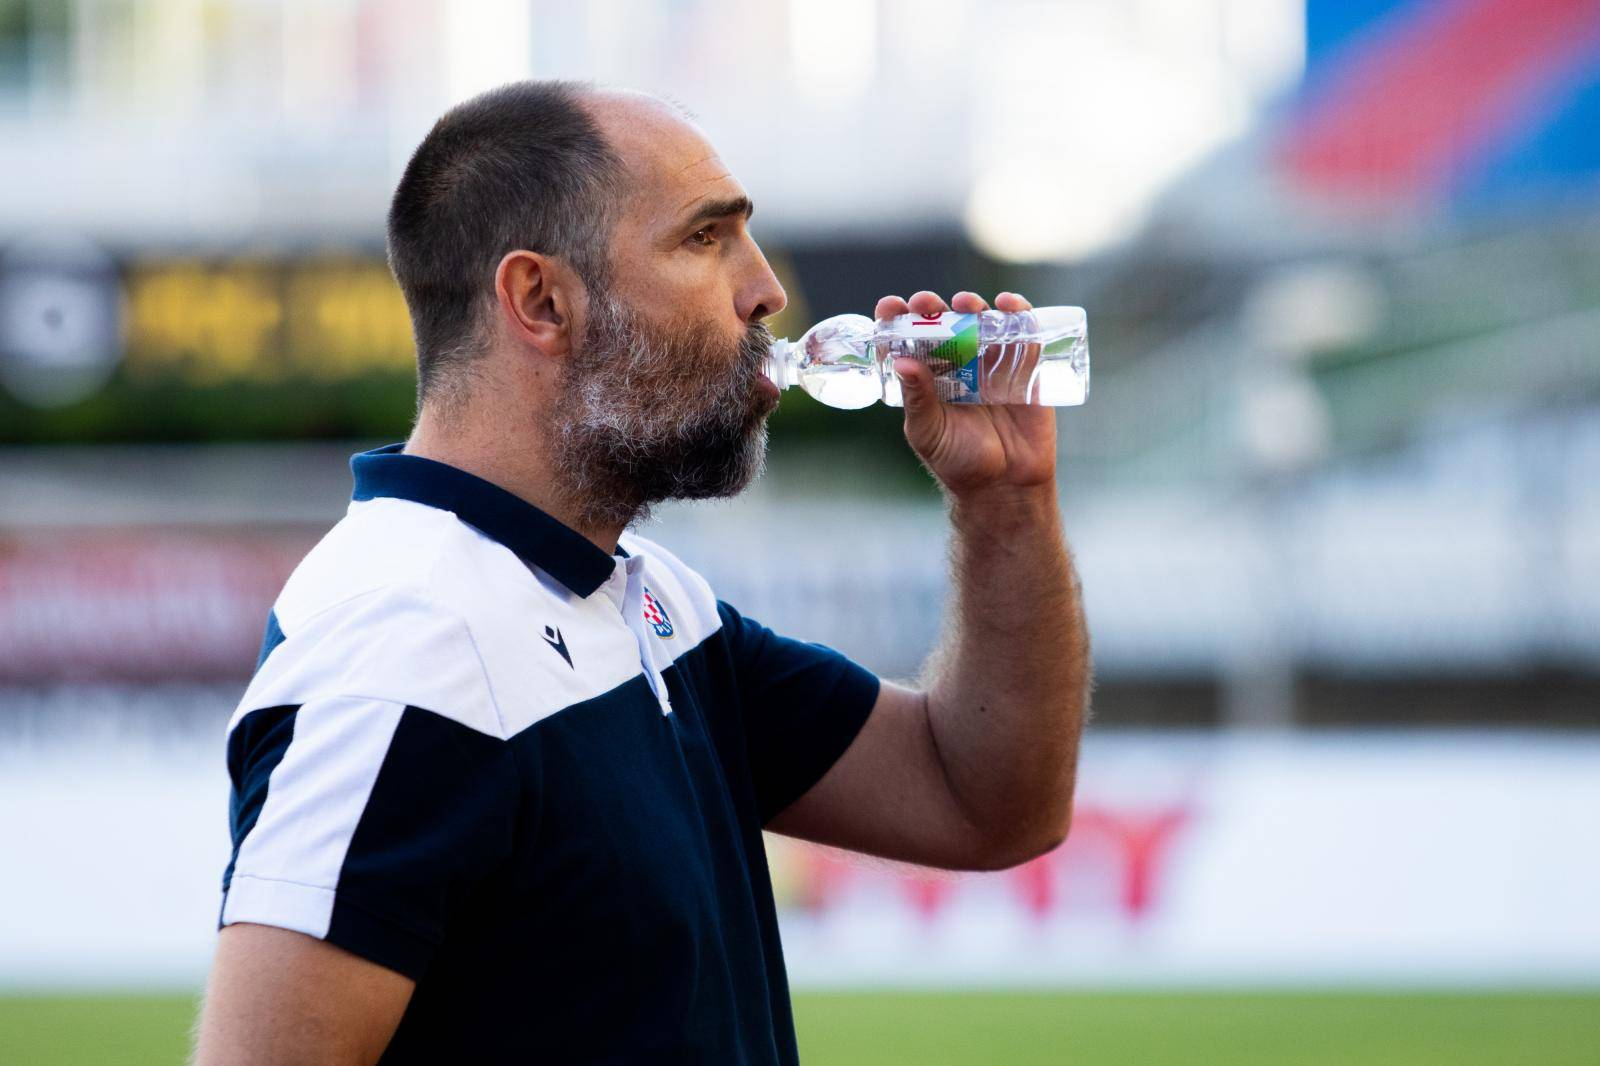 Utakmica 29. kola HT Prve lige izmedu Hajduka i Varazdina